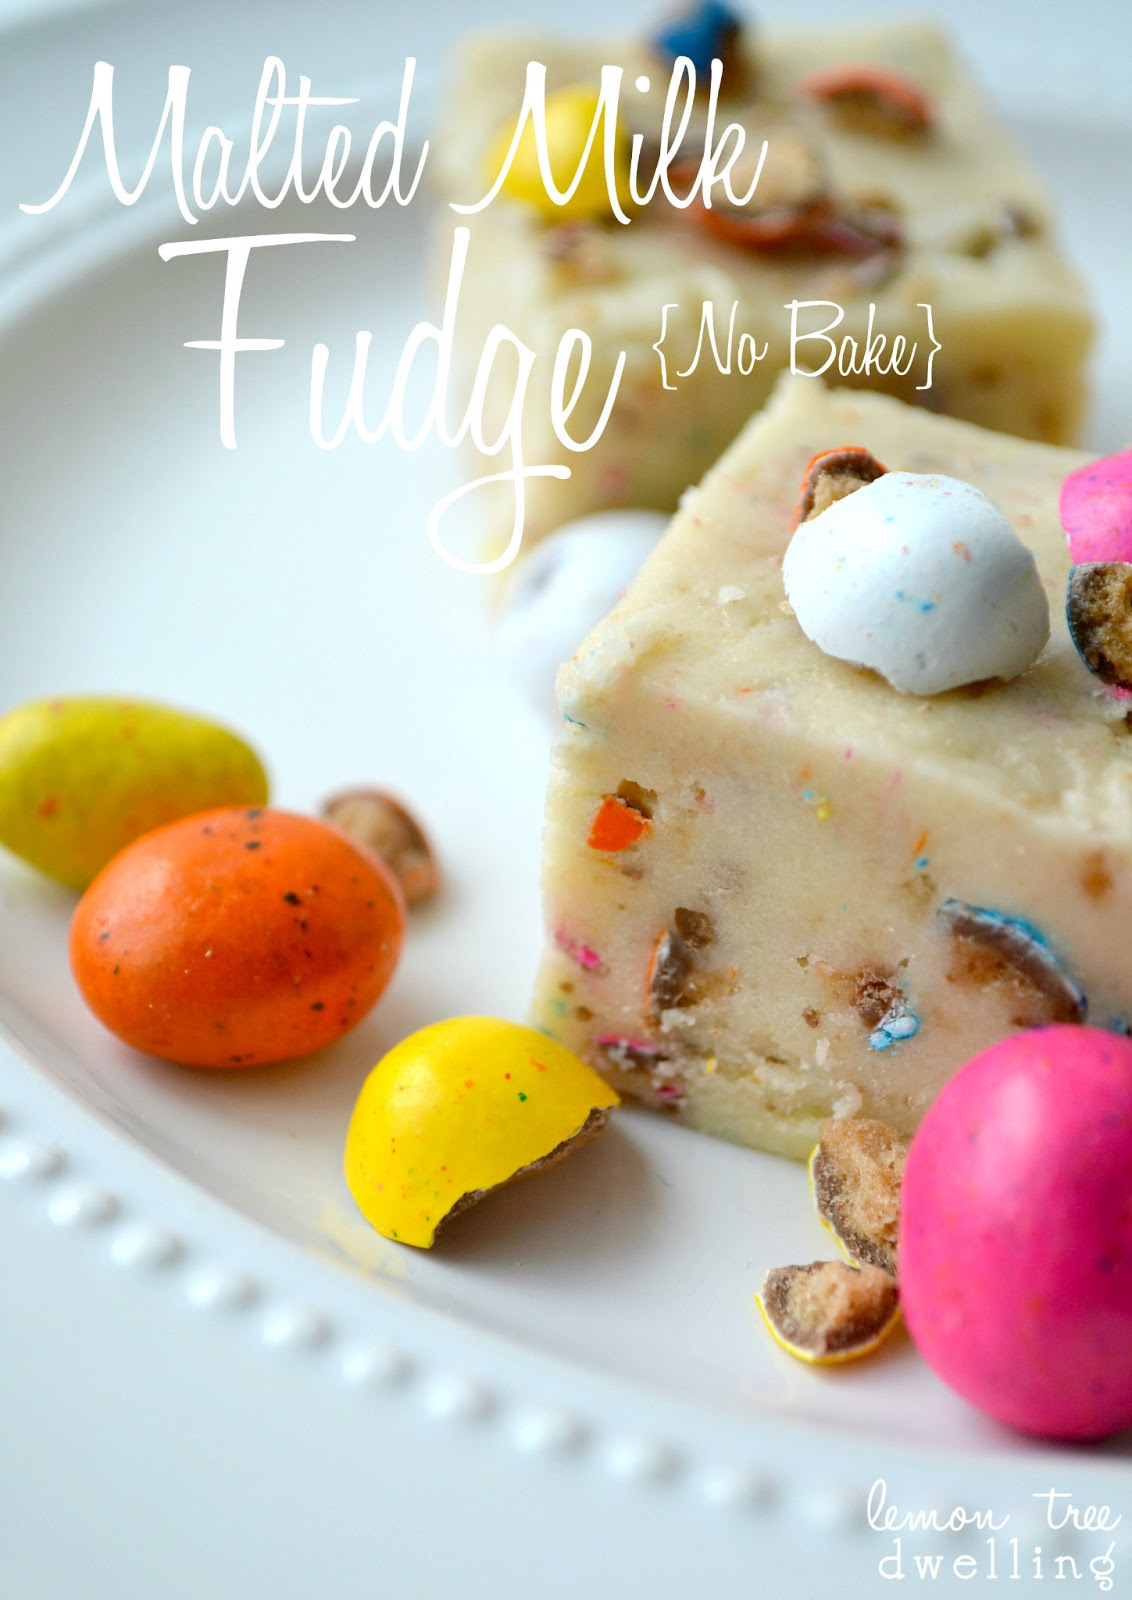 No-Bake} Malted Milk Fudge from Lemon Tree Dwelling #Easter #Treats